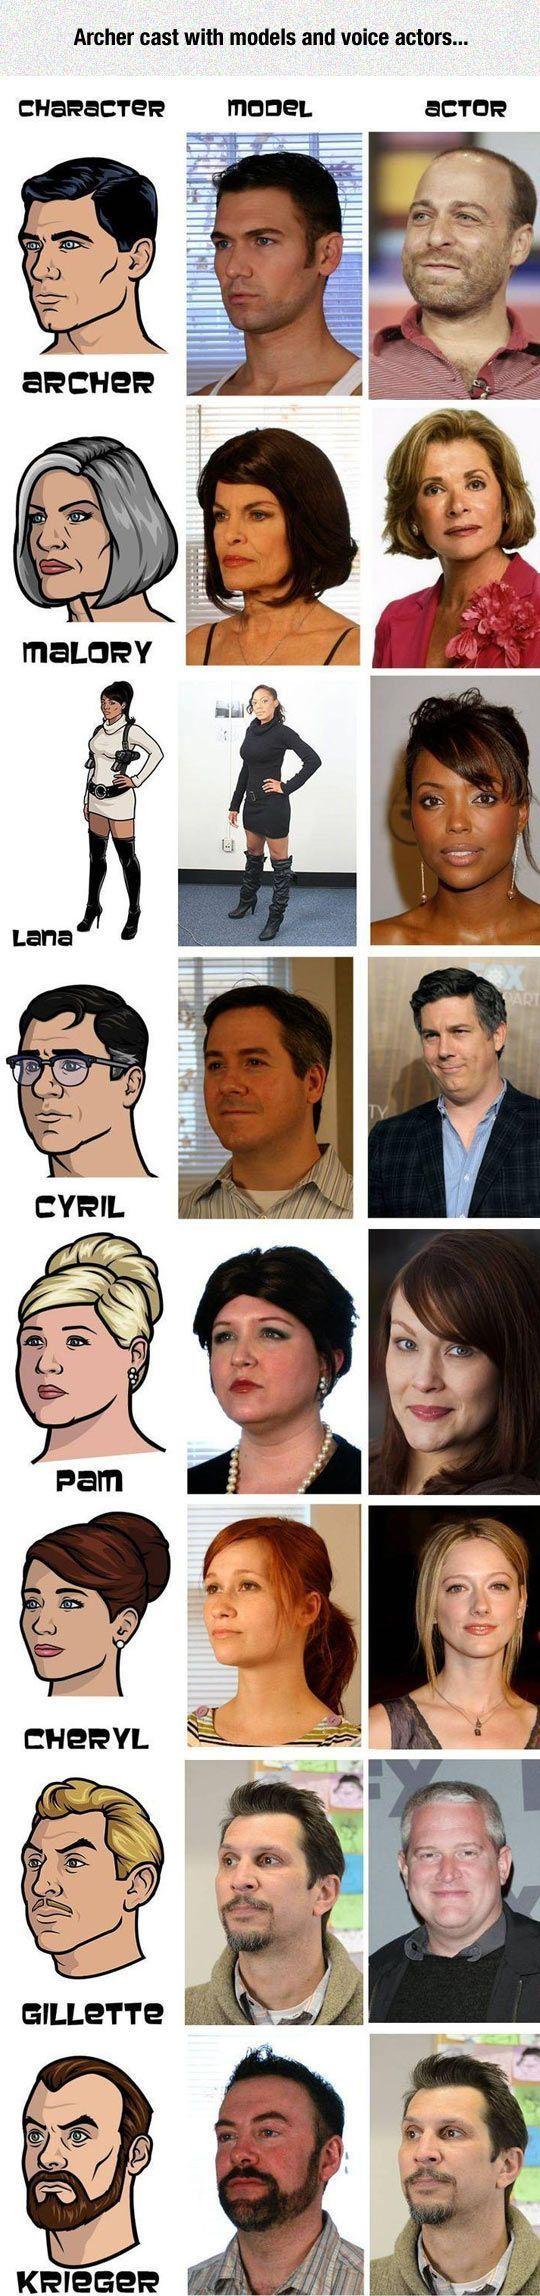 Archer Cast With Models And Voice Actors tv cartoons actors tv shows funny shows archer